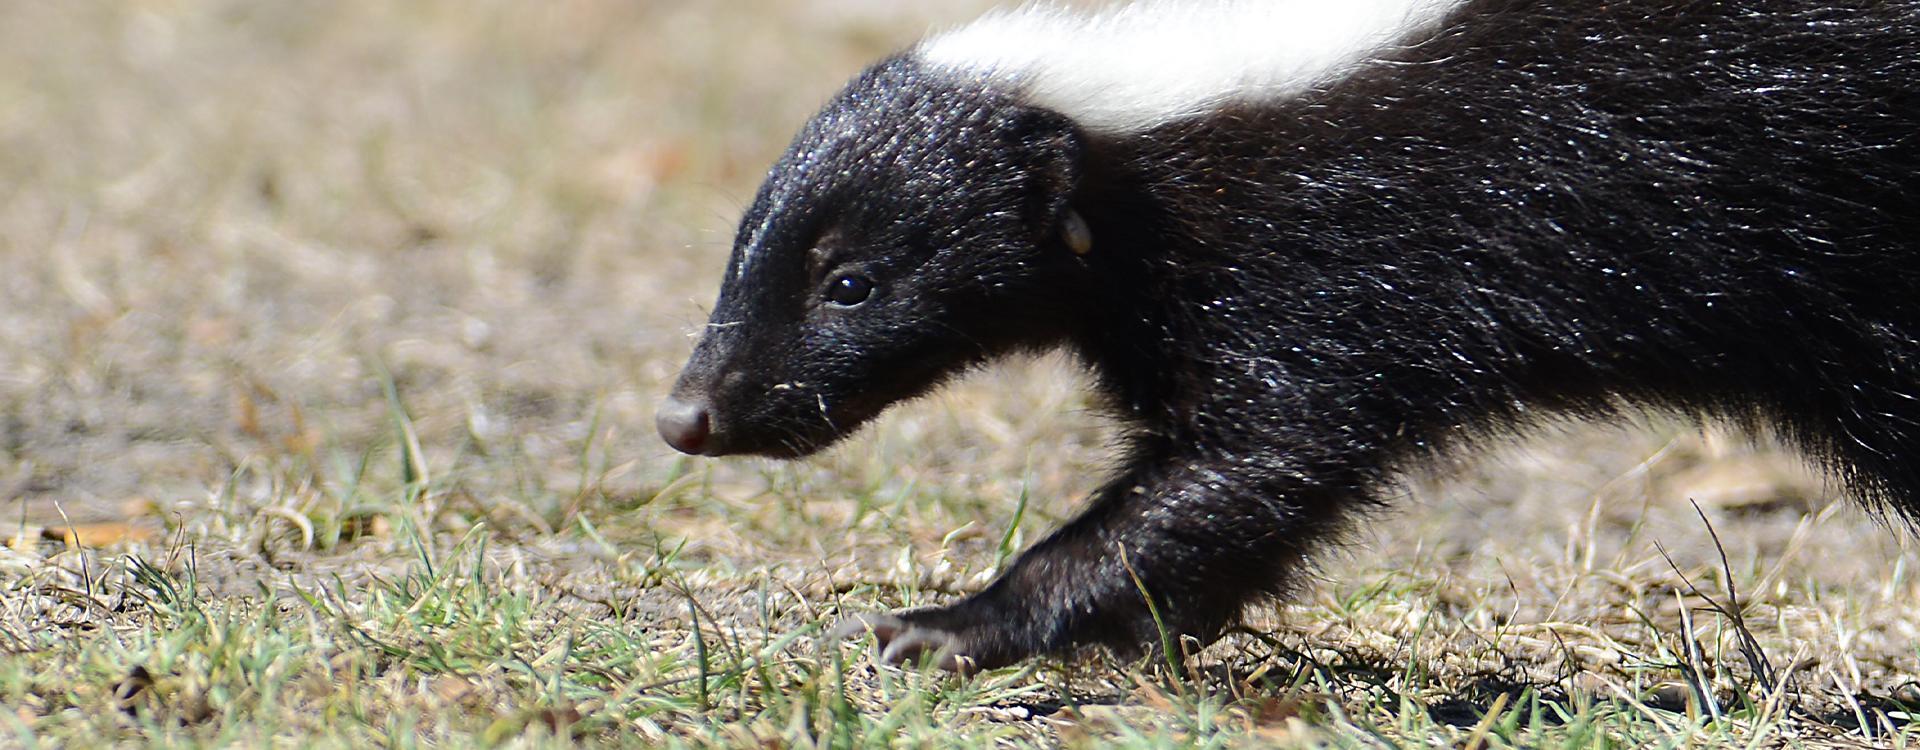 a skunk in a california back yard